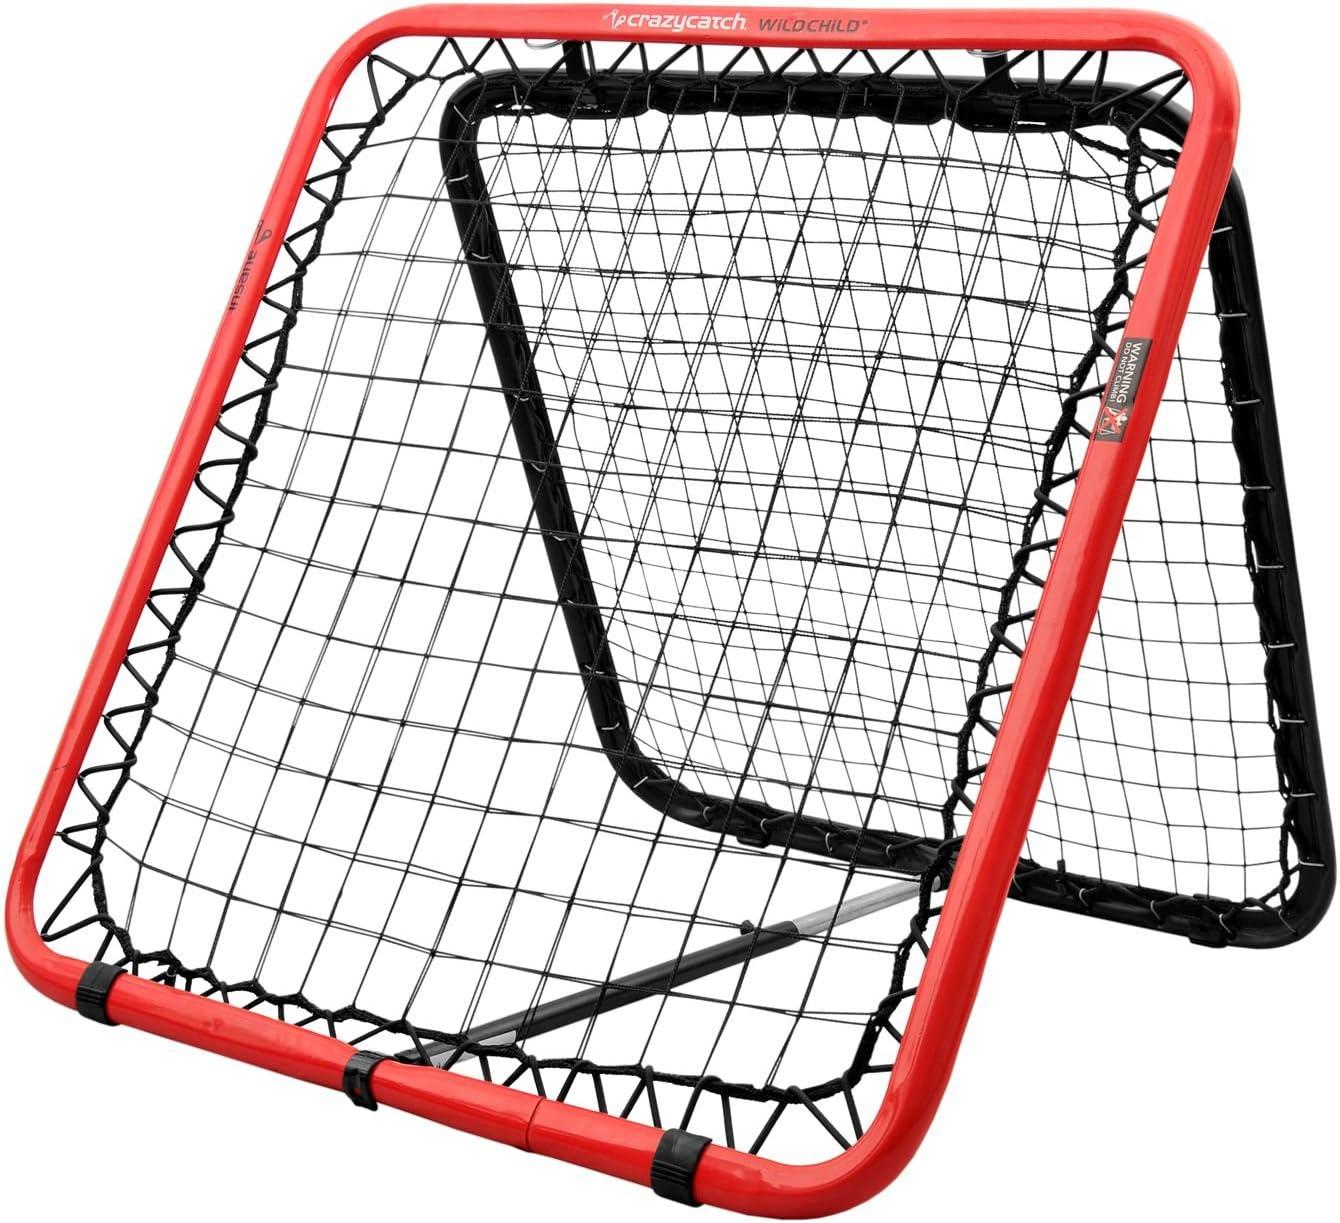 Crazy Catch Wild Child 2.0 Sport Rebounder Net - Best for goalkeepers